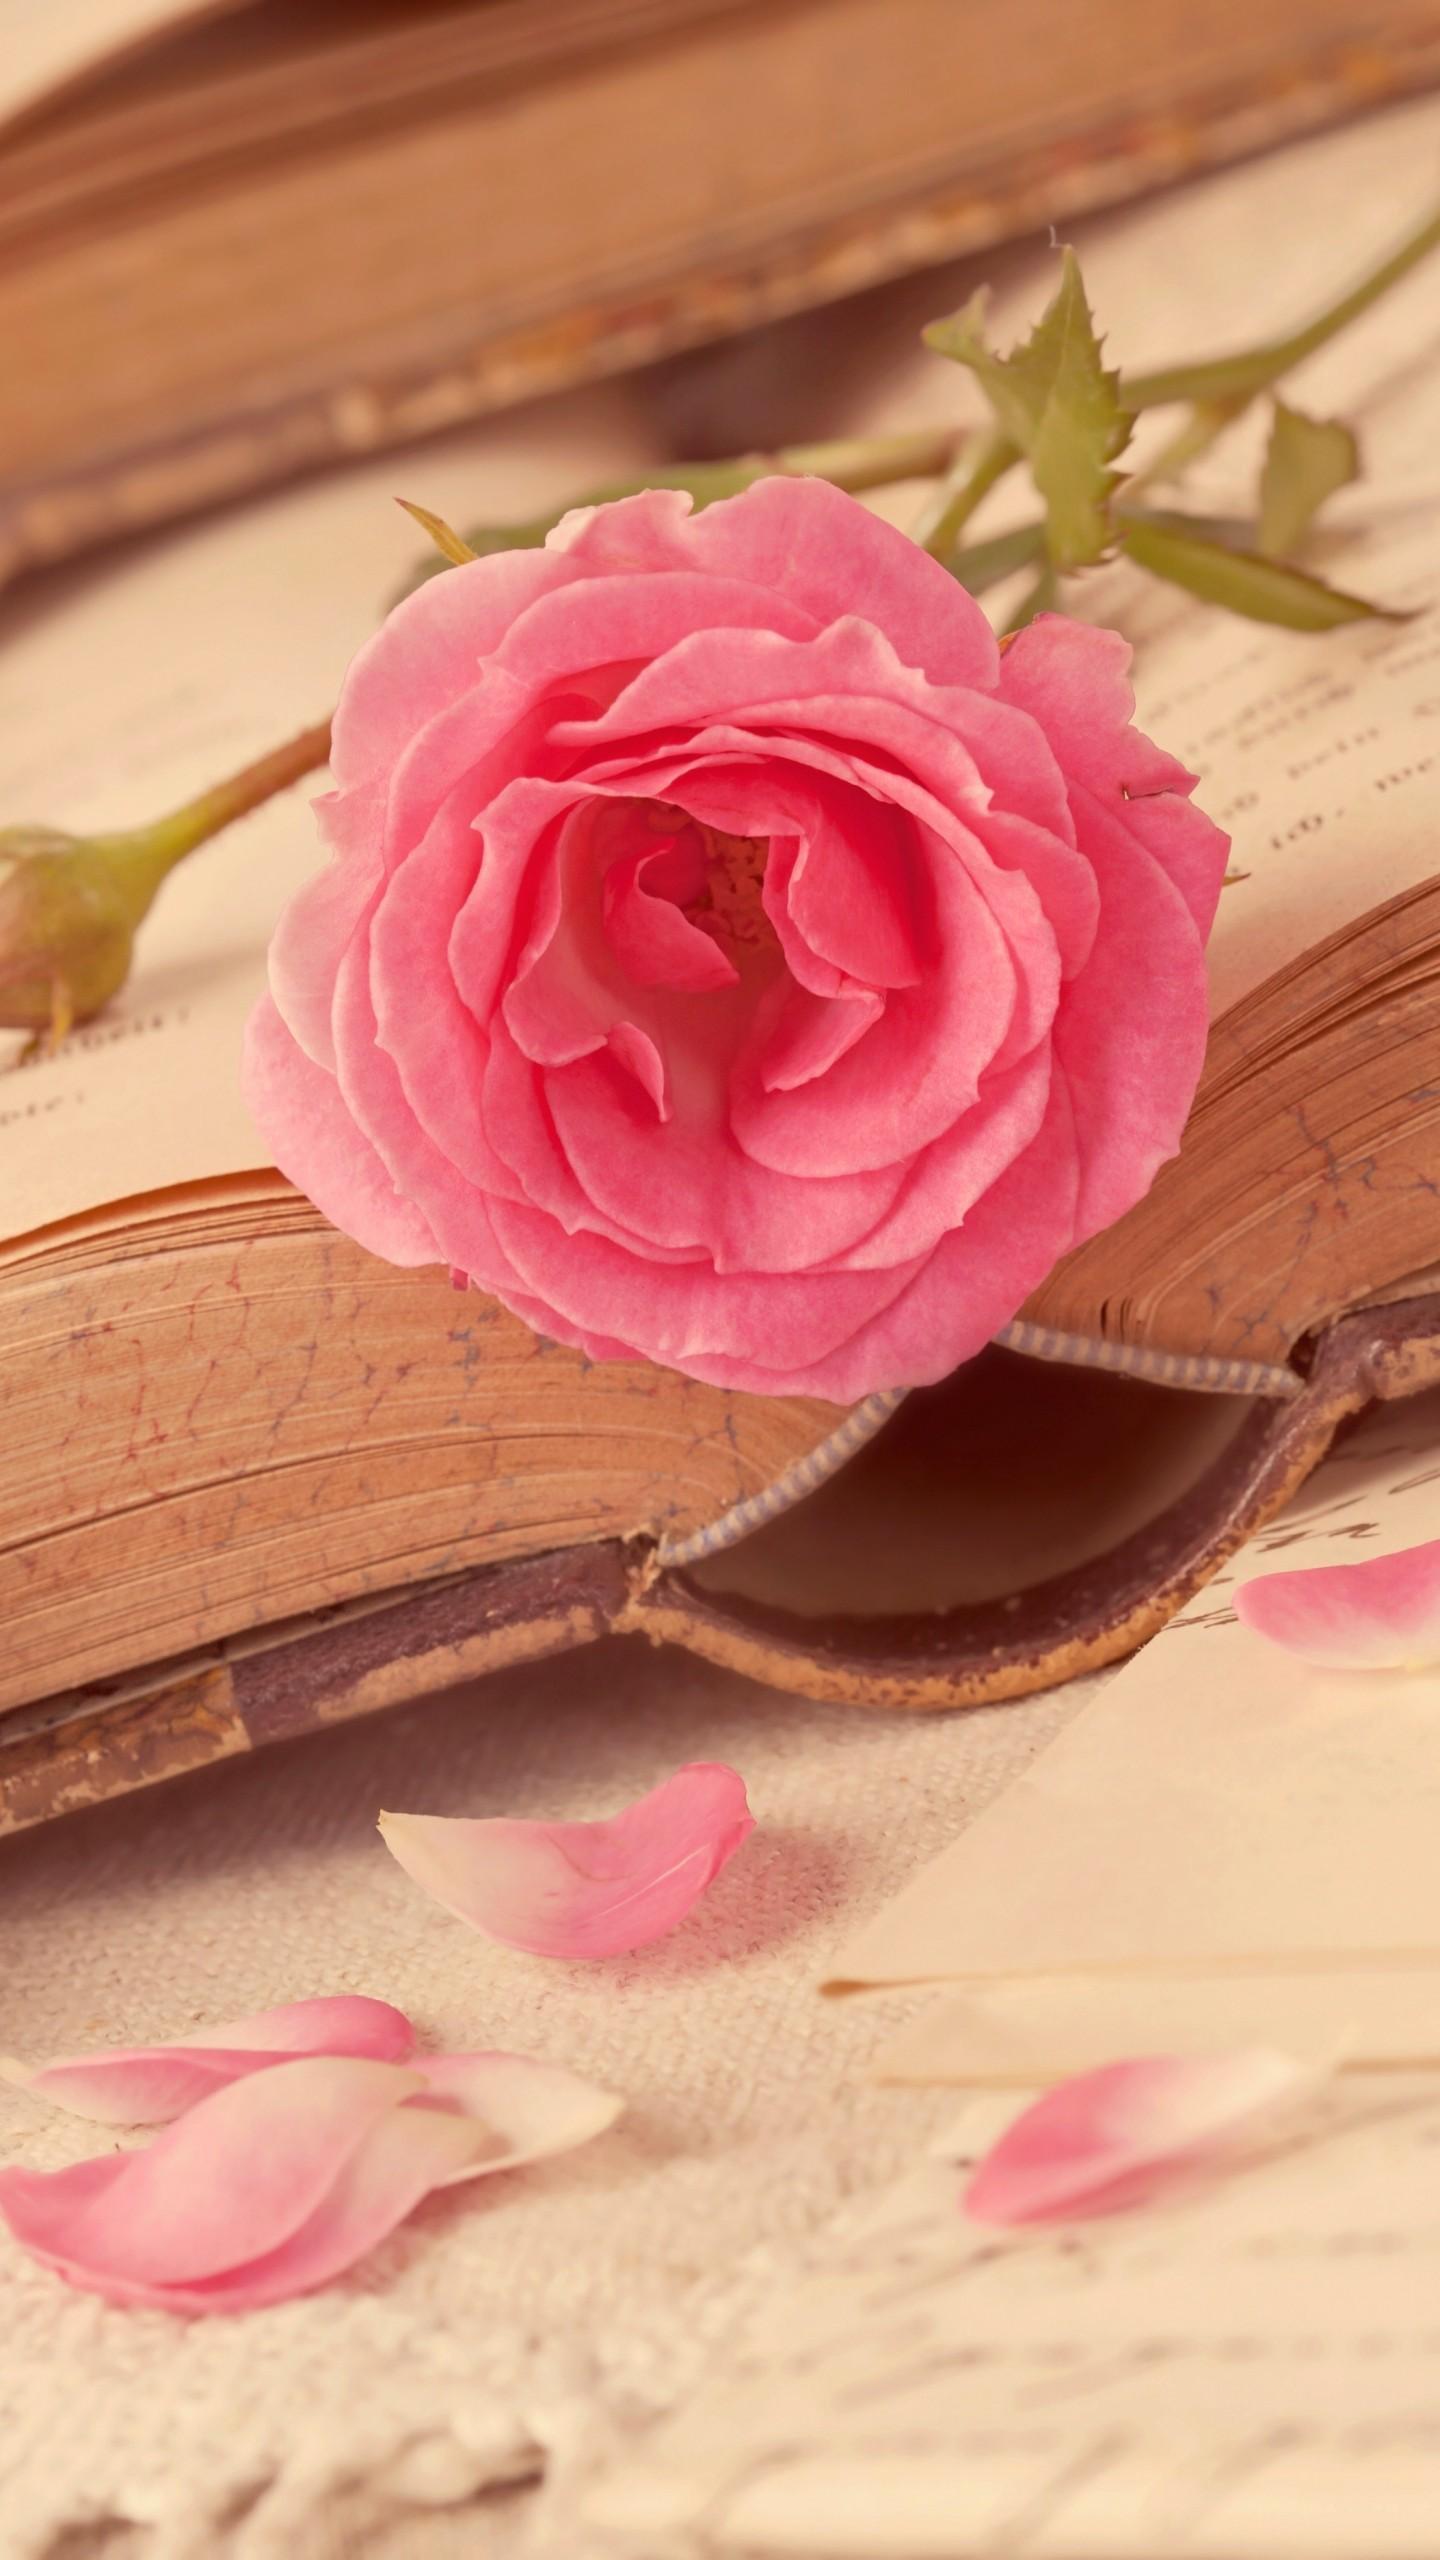 عکس زمینه قلب و عشق و گل رز صورتی پس زمینه